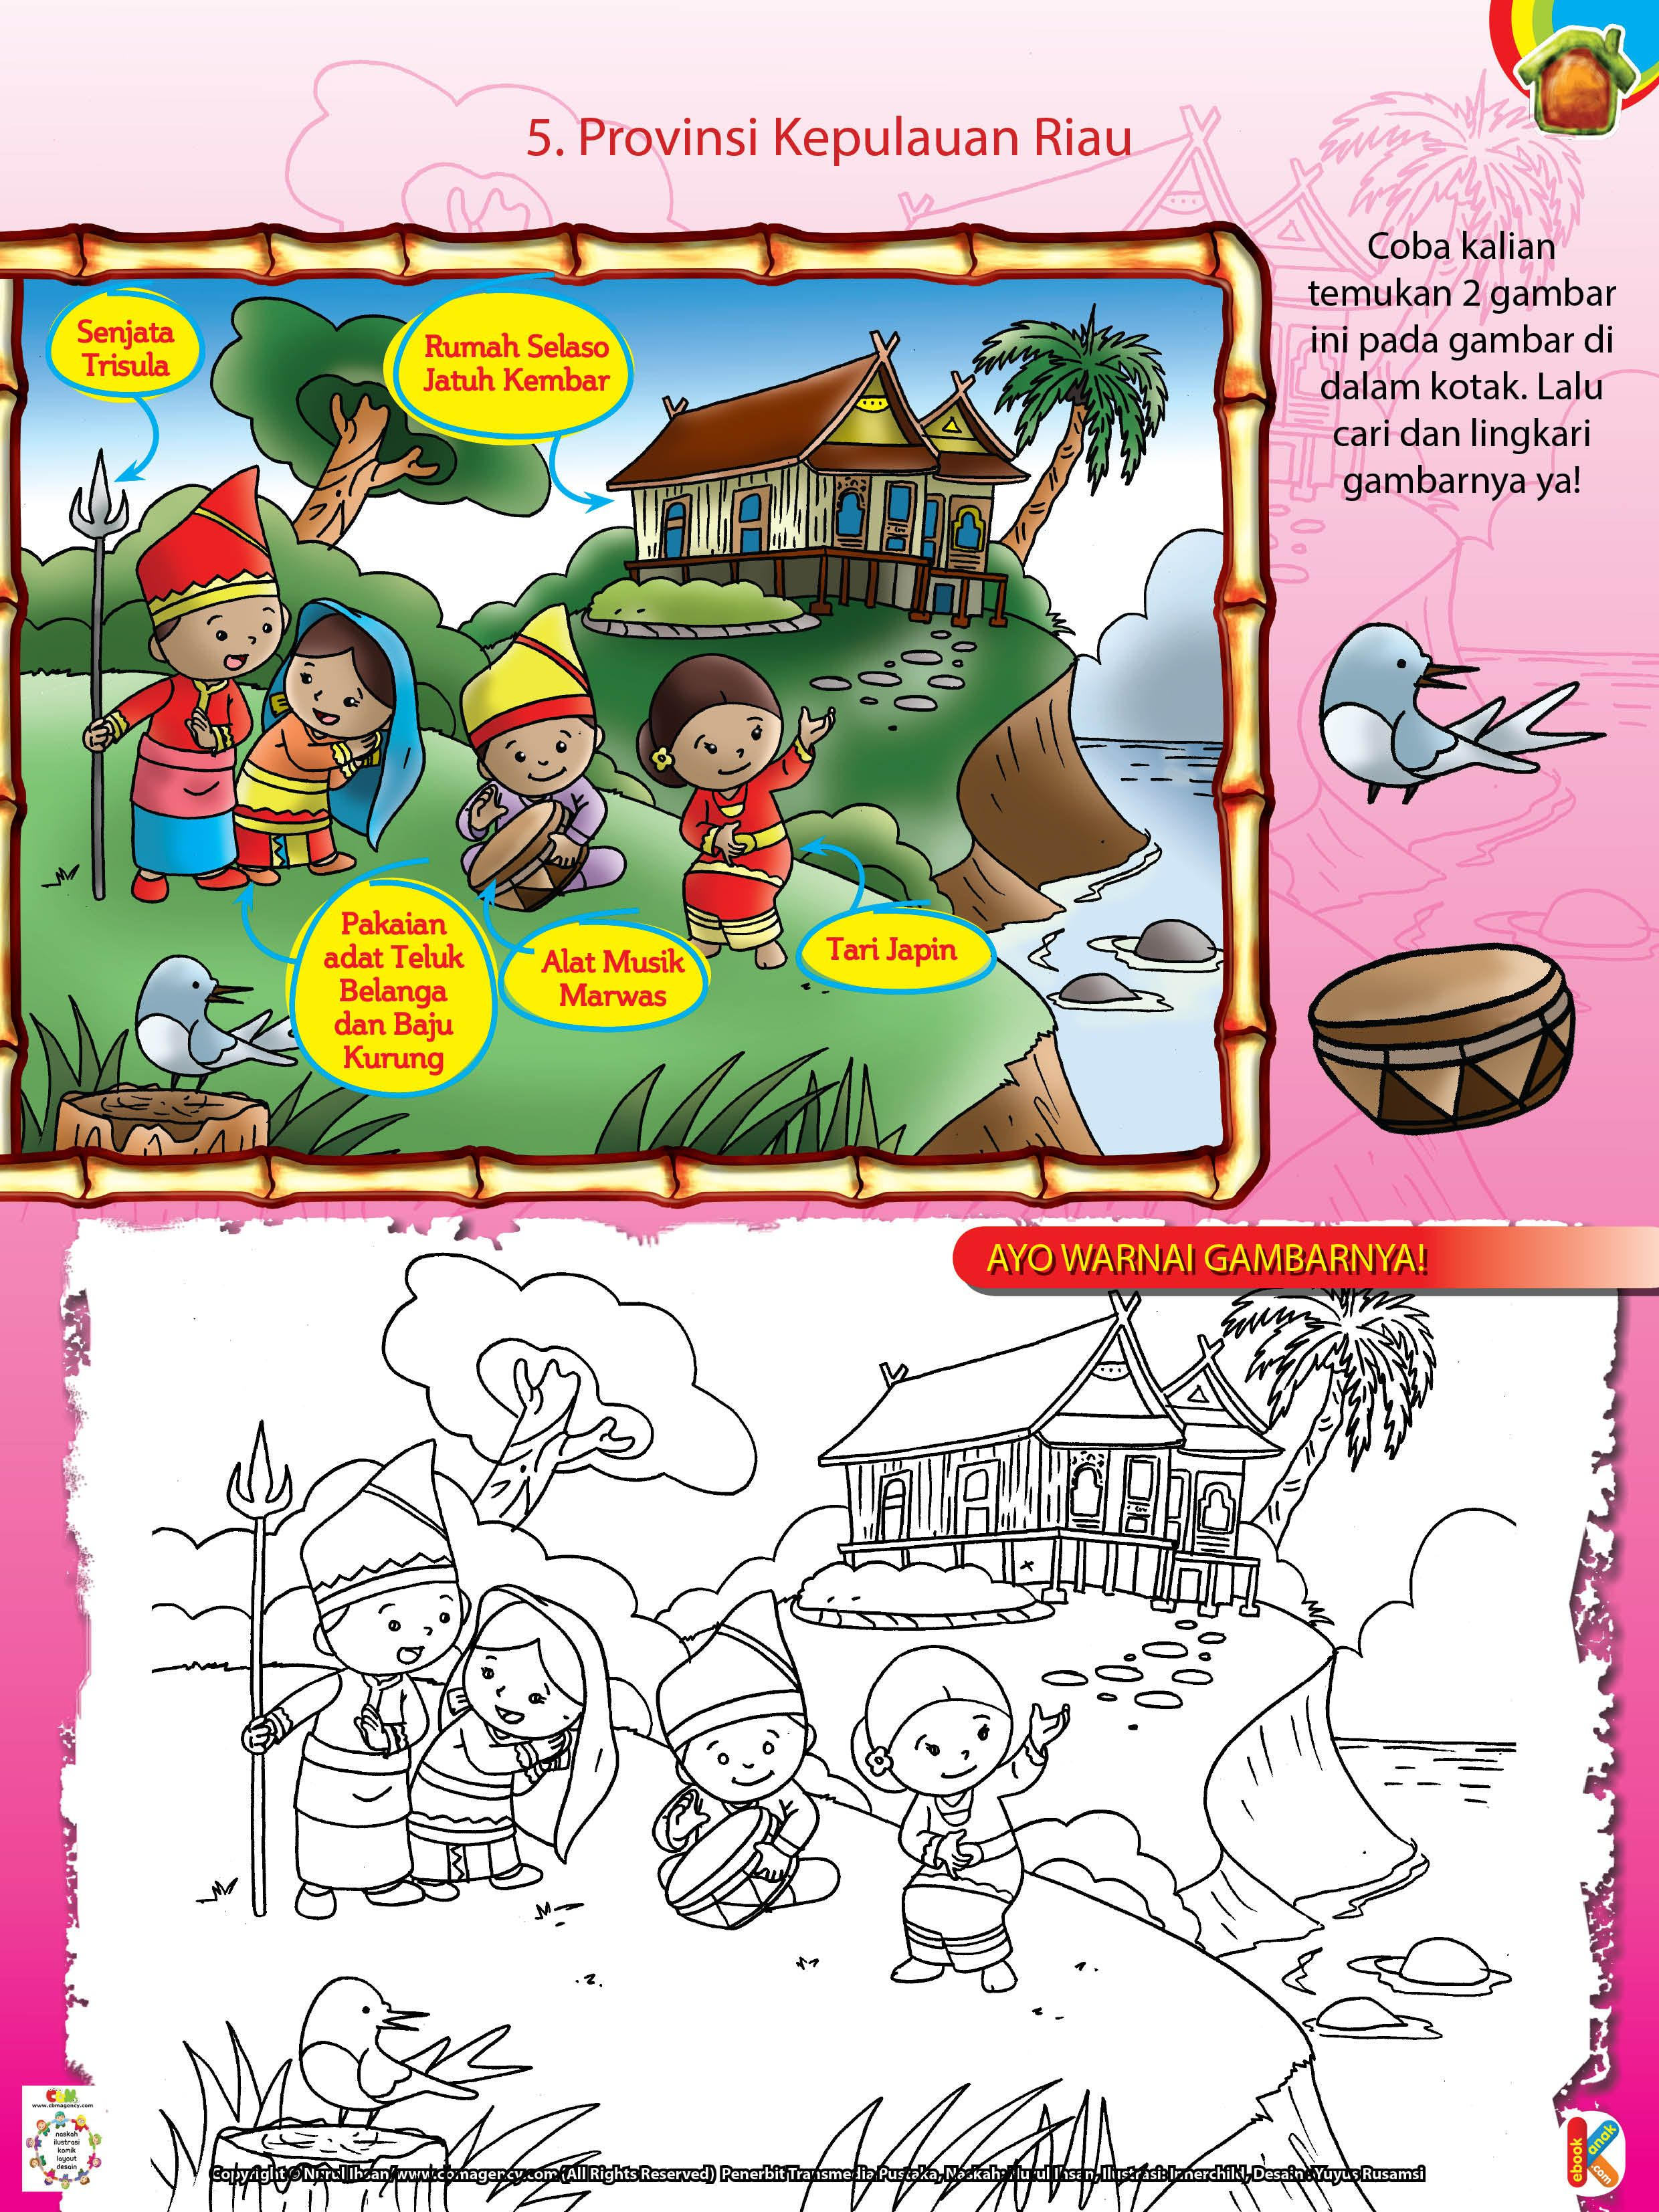 Pakaian Adat Belanga Kepulauan Riau